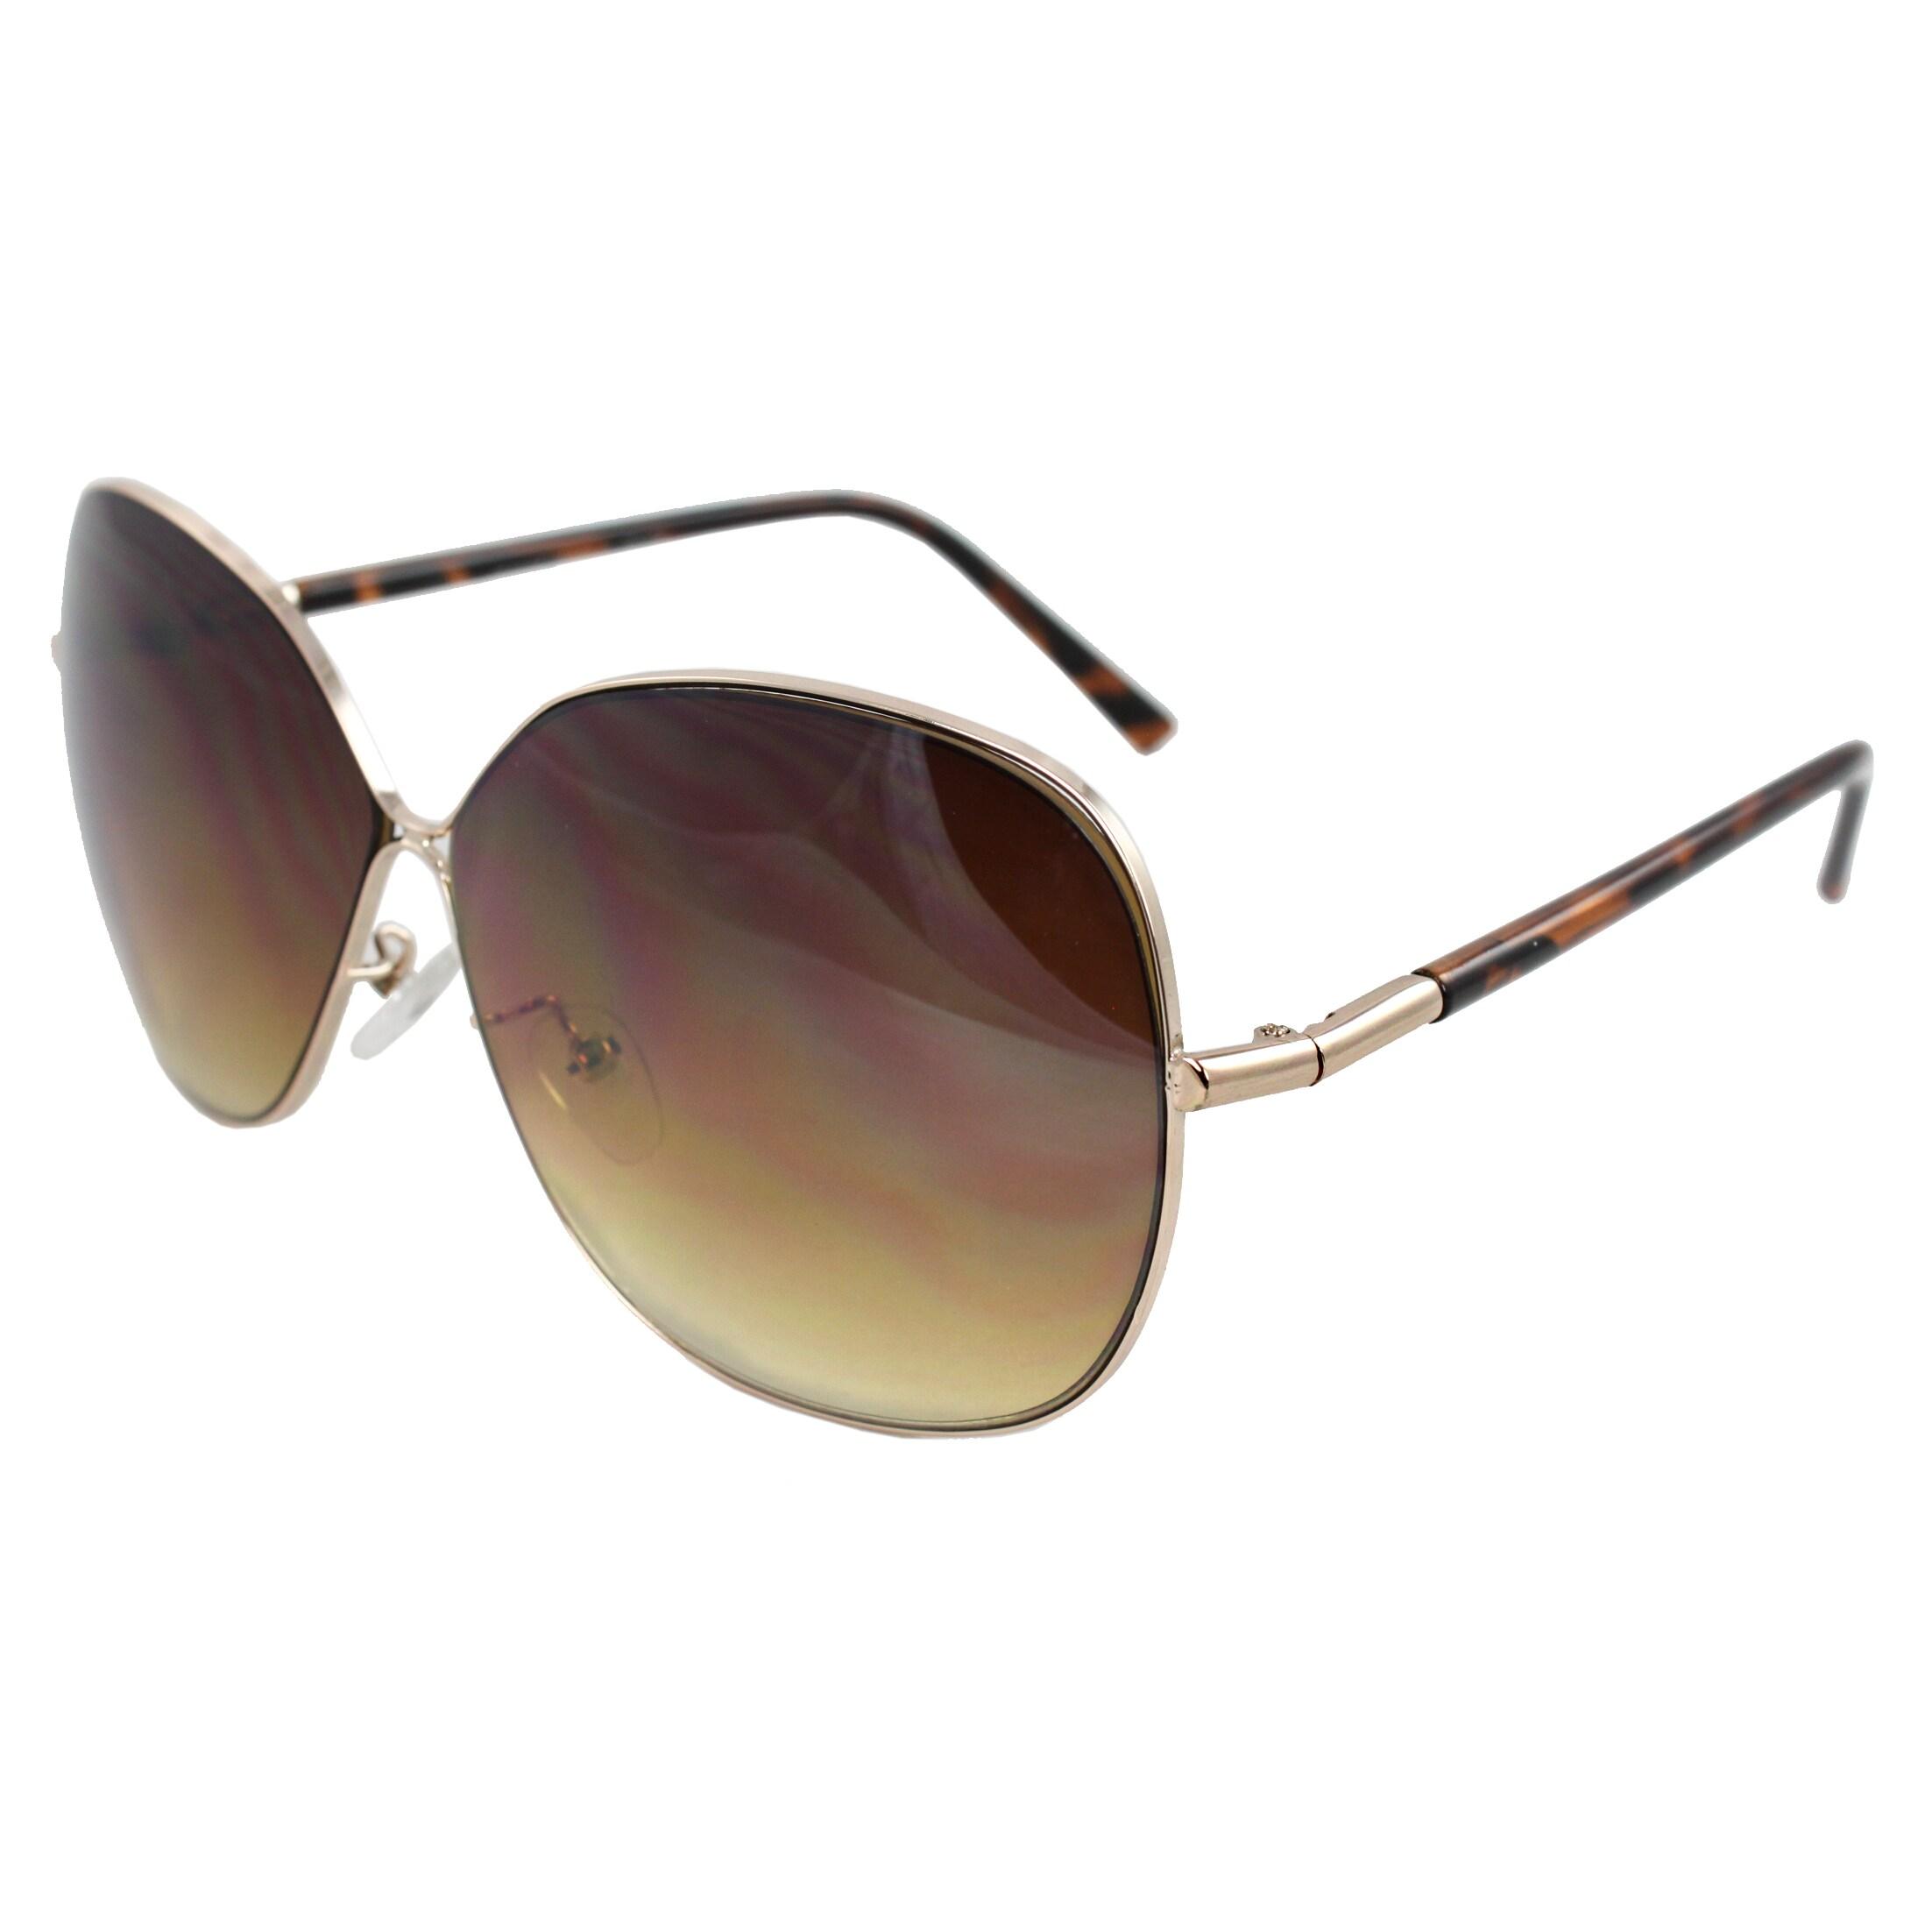 Women's Oval Fashion Sunglasses